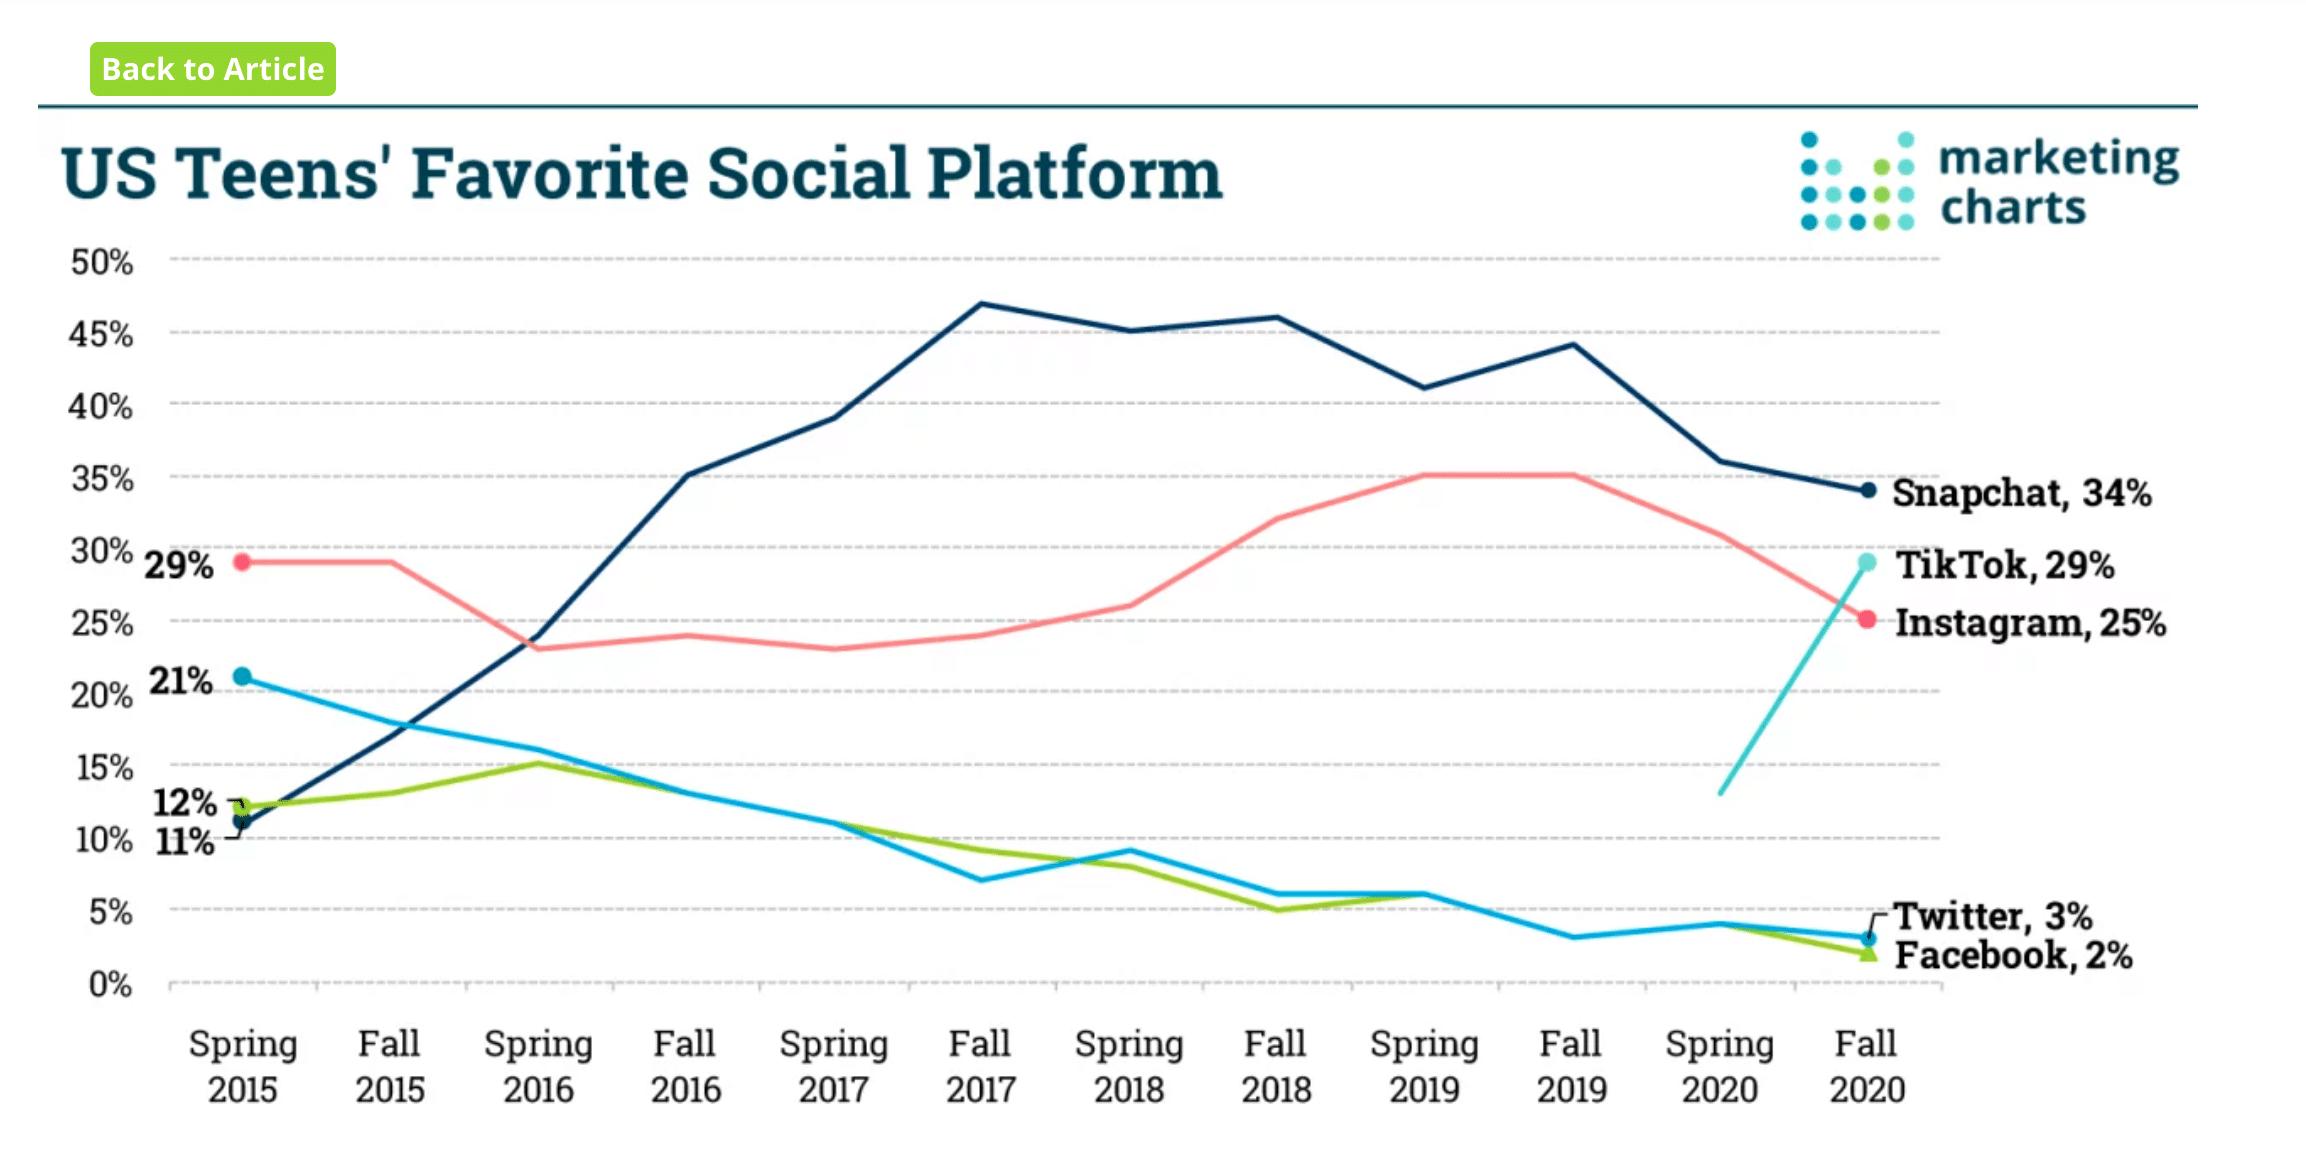 U.S. teens' favorite social platform